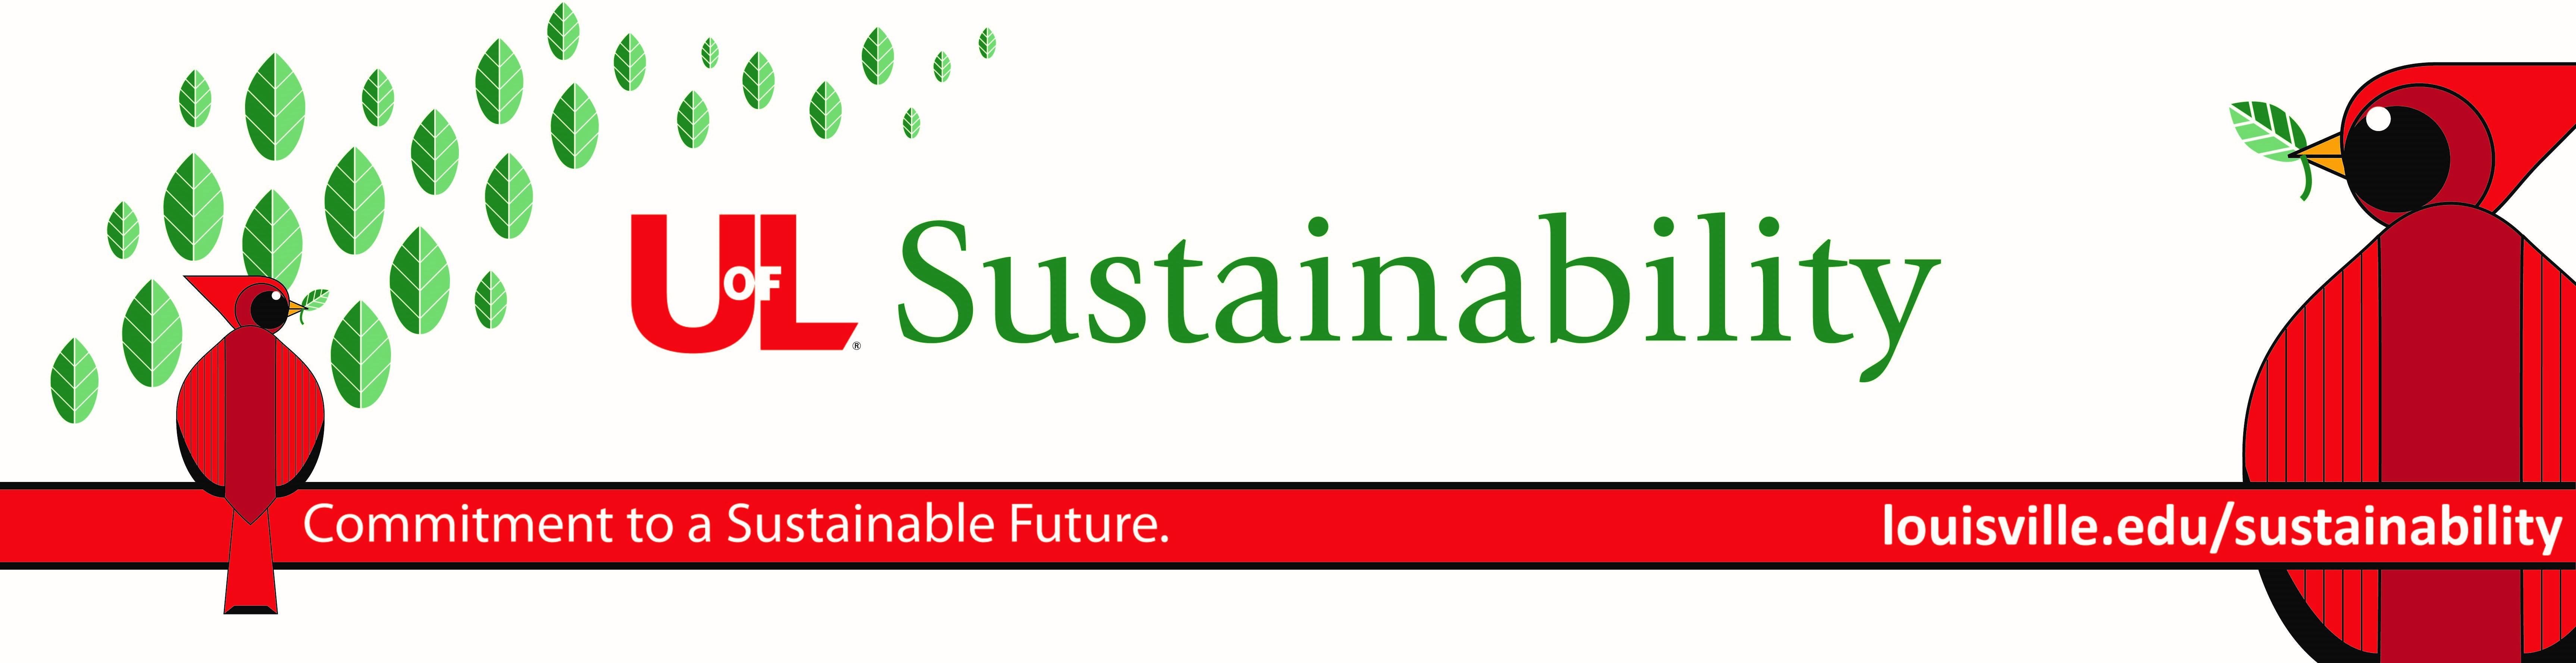 UofL Sustainability Banner